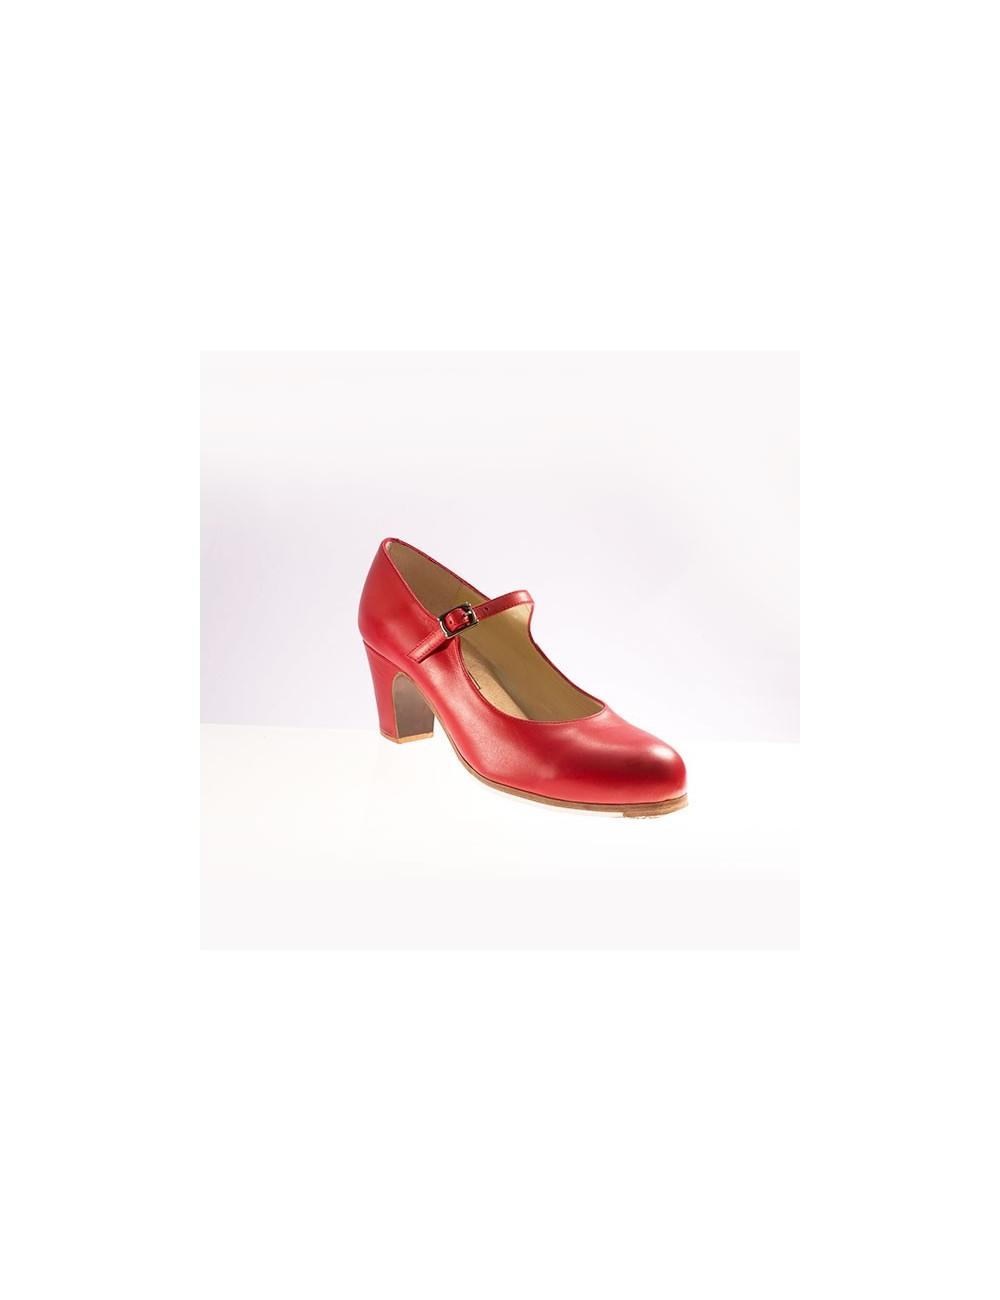 Chaussures Professionnelles Begona M01 Rouge